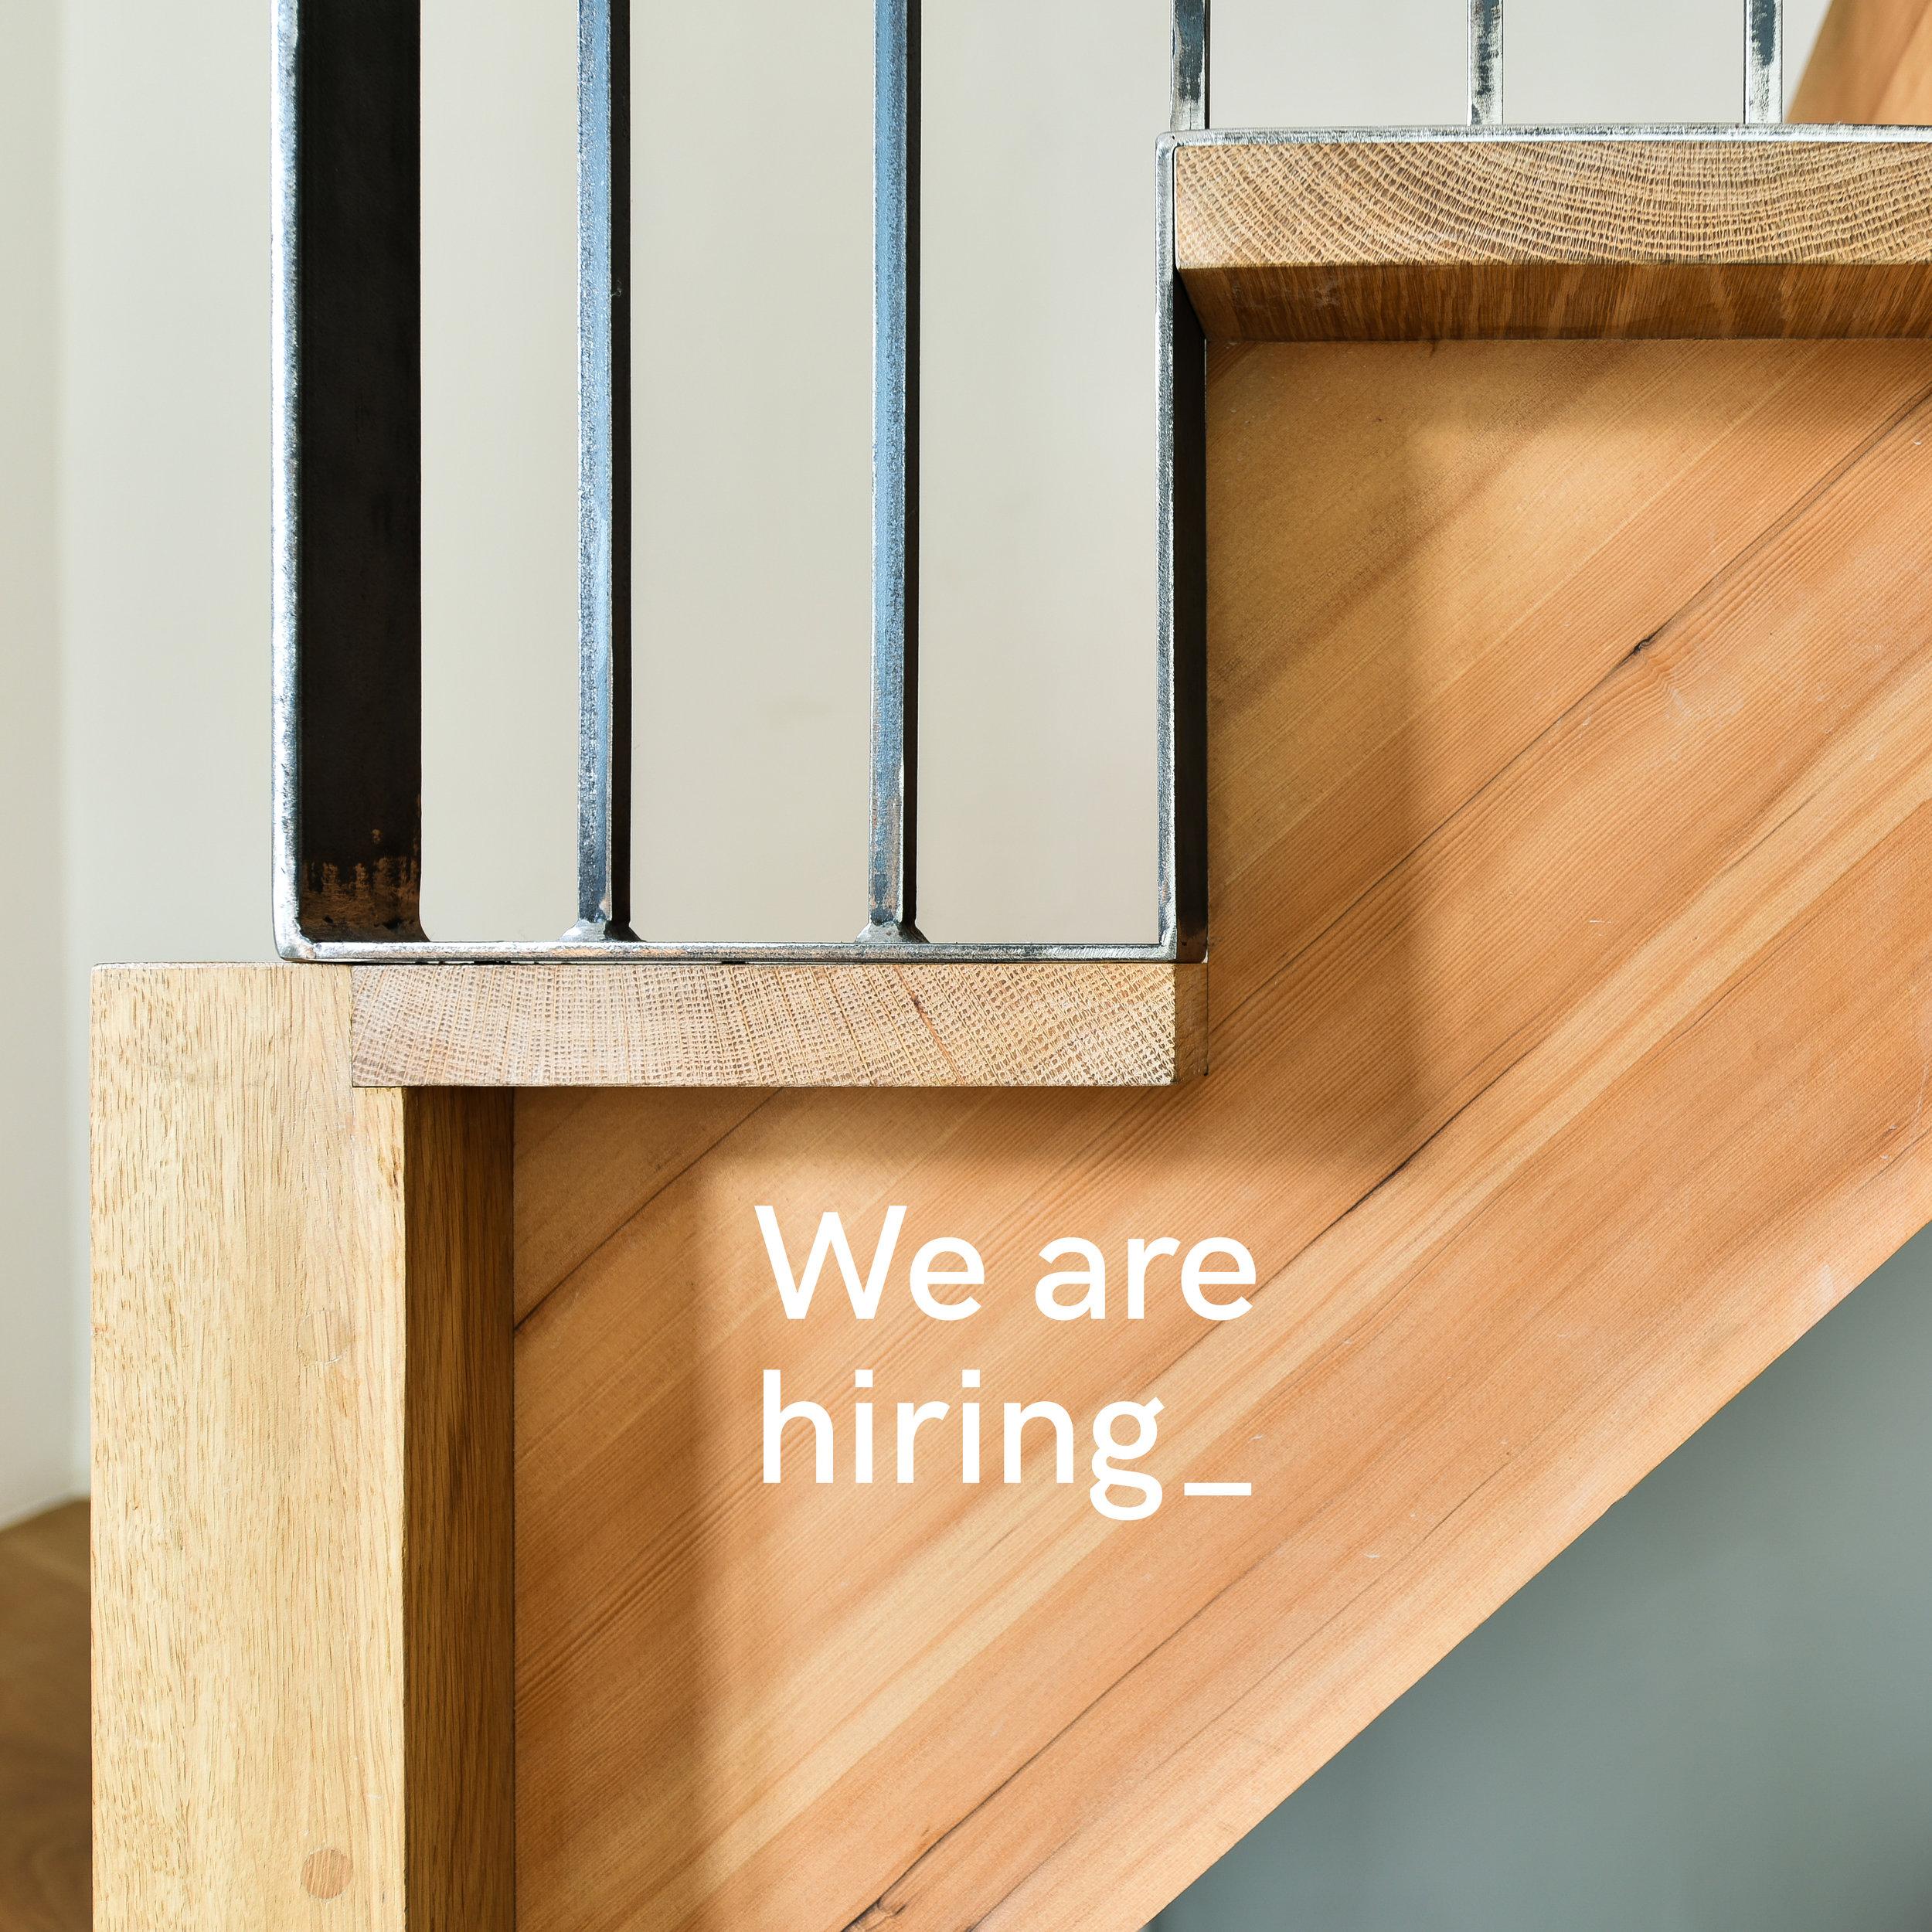 We are hiring_02.jpg